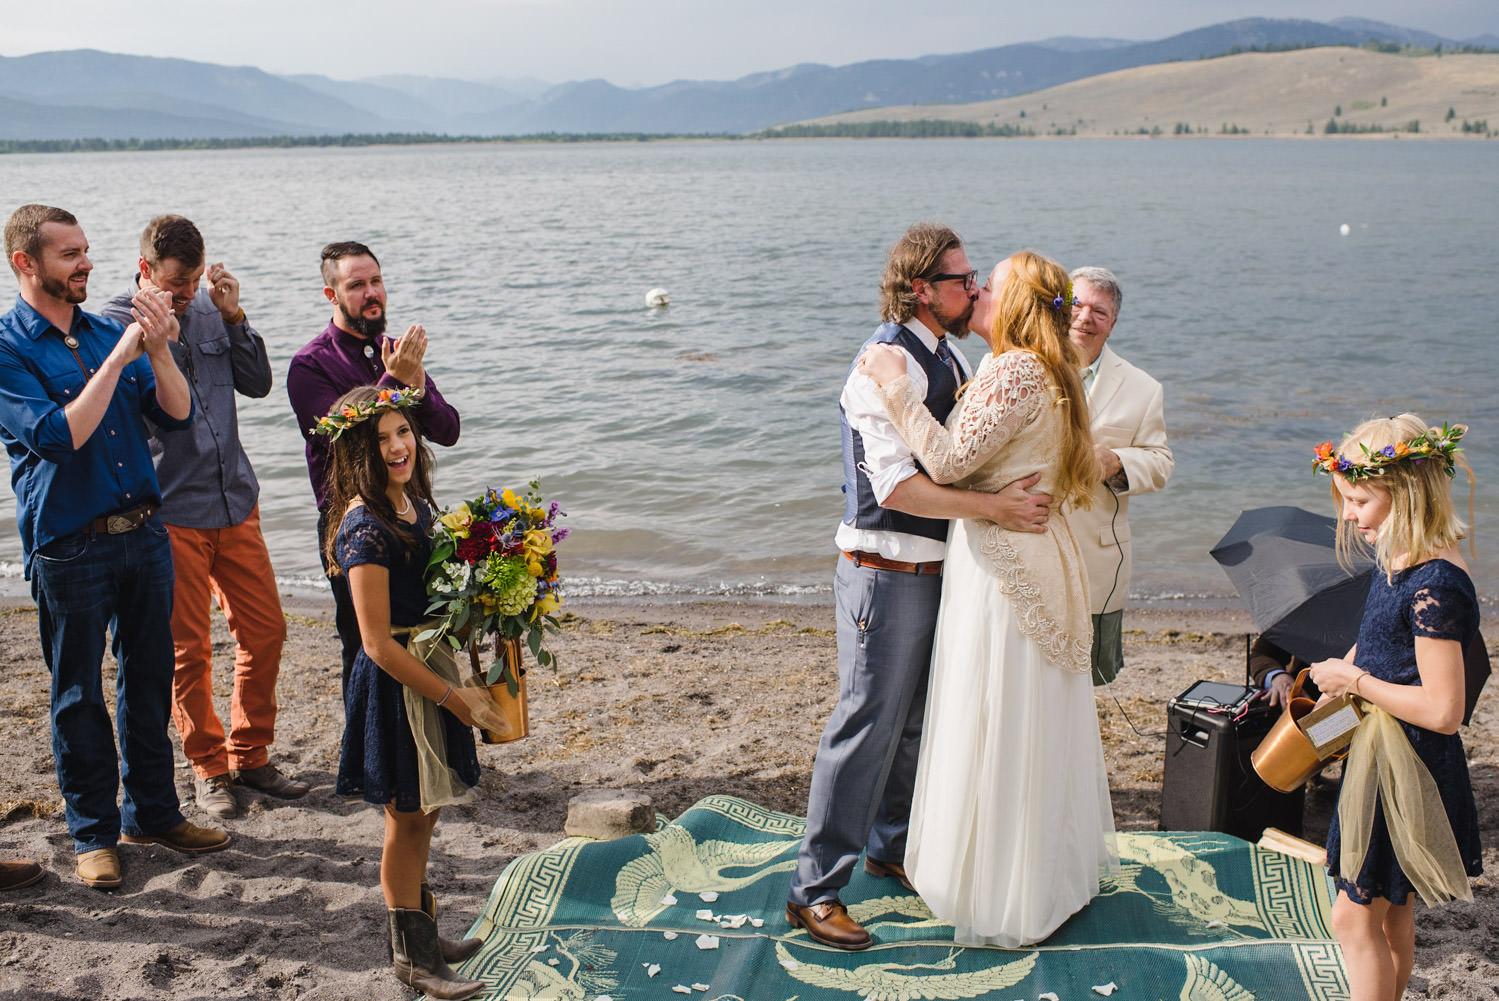 West Yellowstone Wedding newlywed's first kiss photo